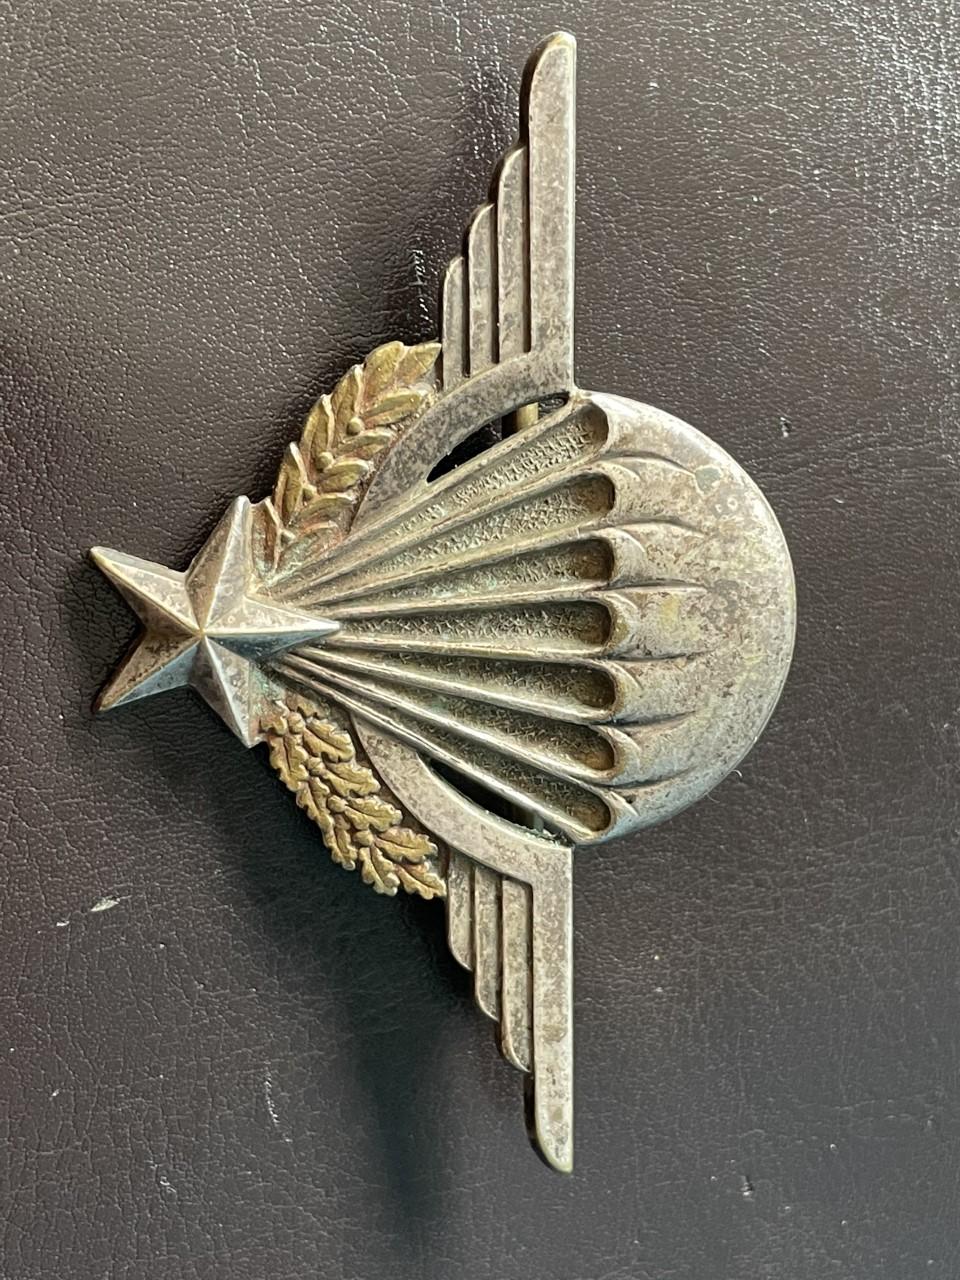 un BMP drago beranger et un insigne emi Cherchell  Thumb148